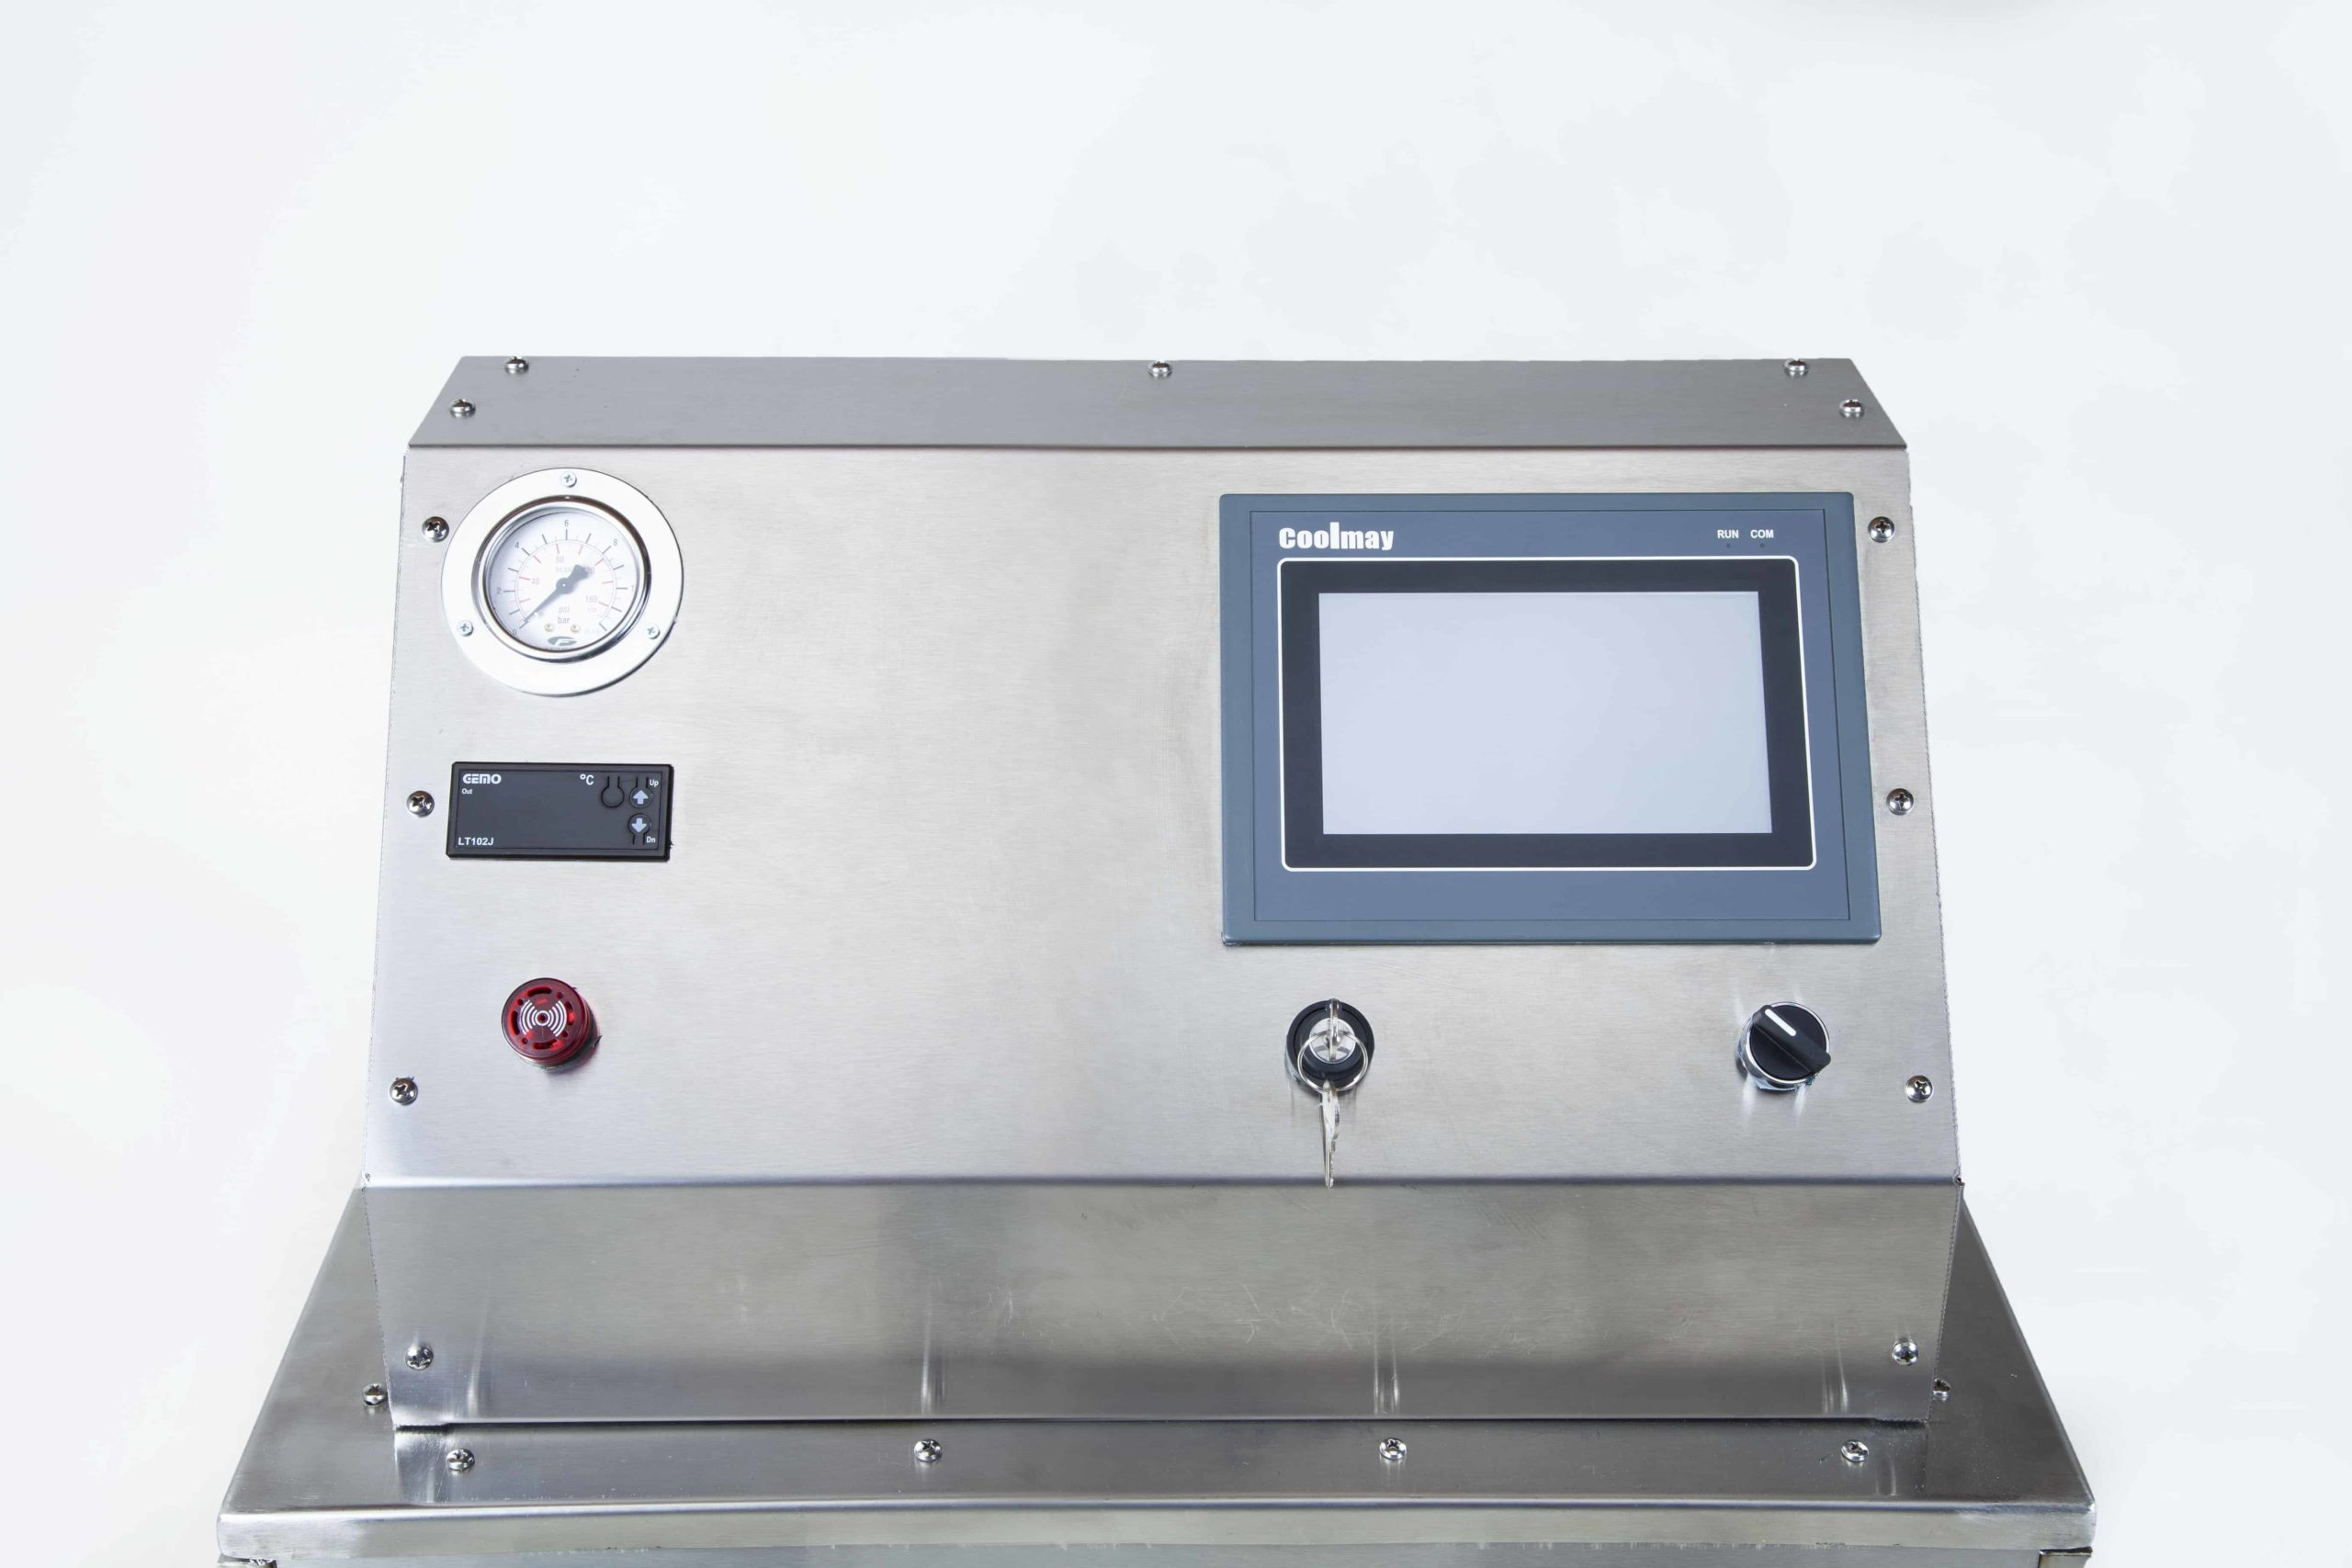 UNI SVC 27-48 Steam Cleaner Machine Panel View